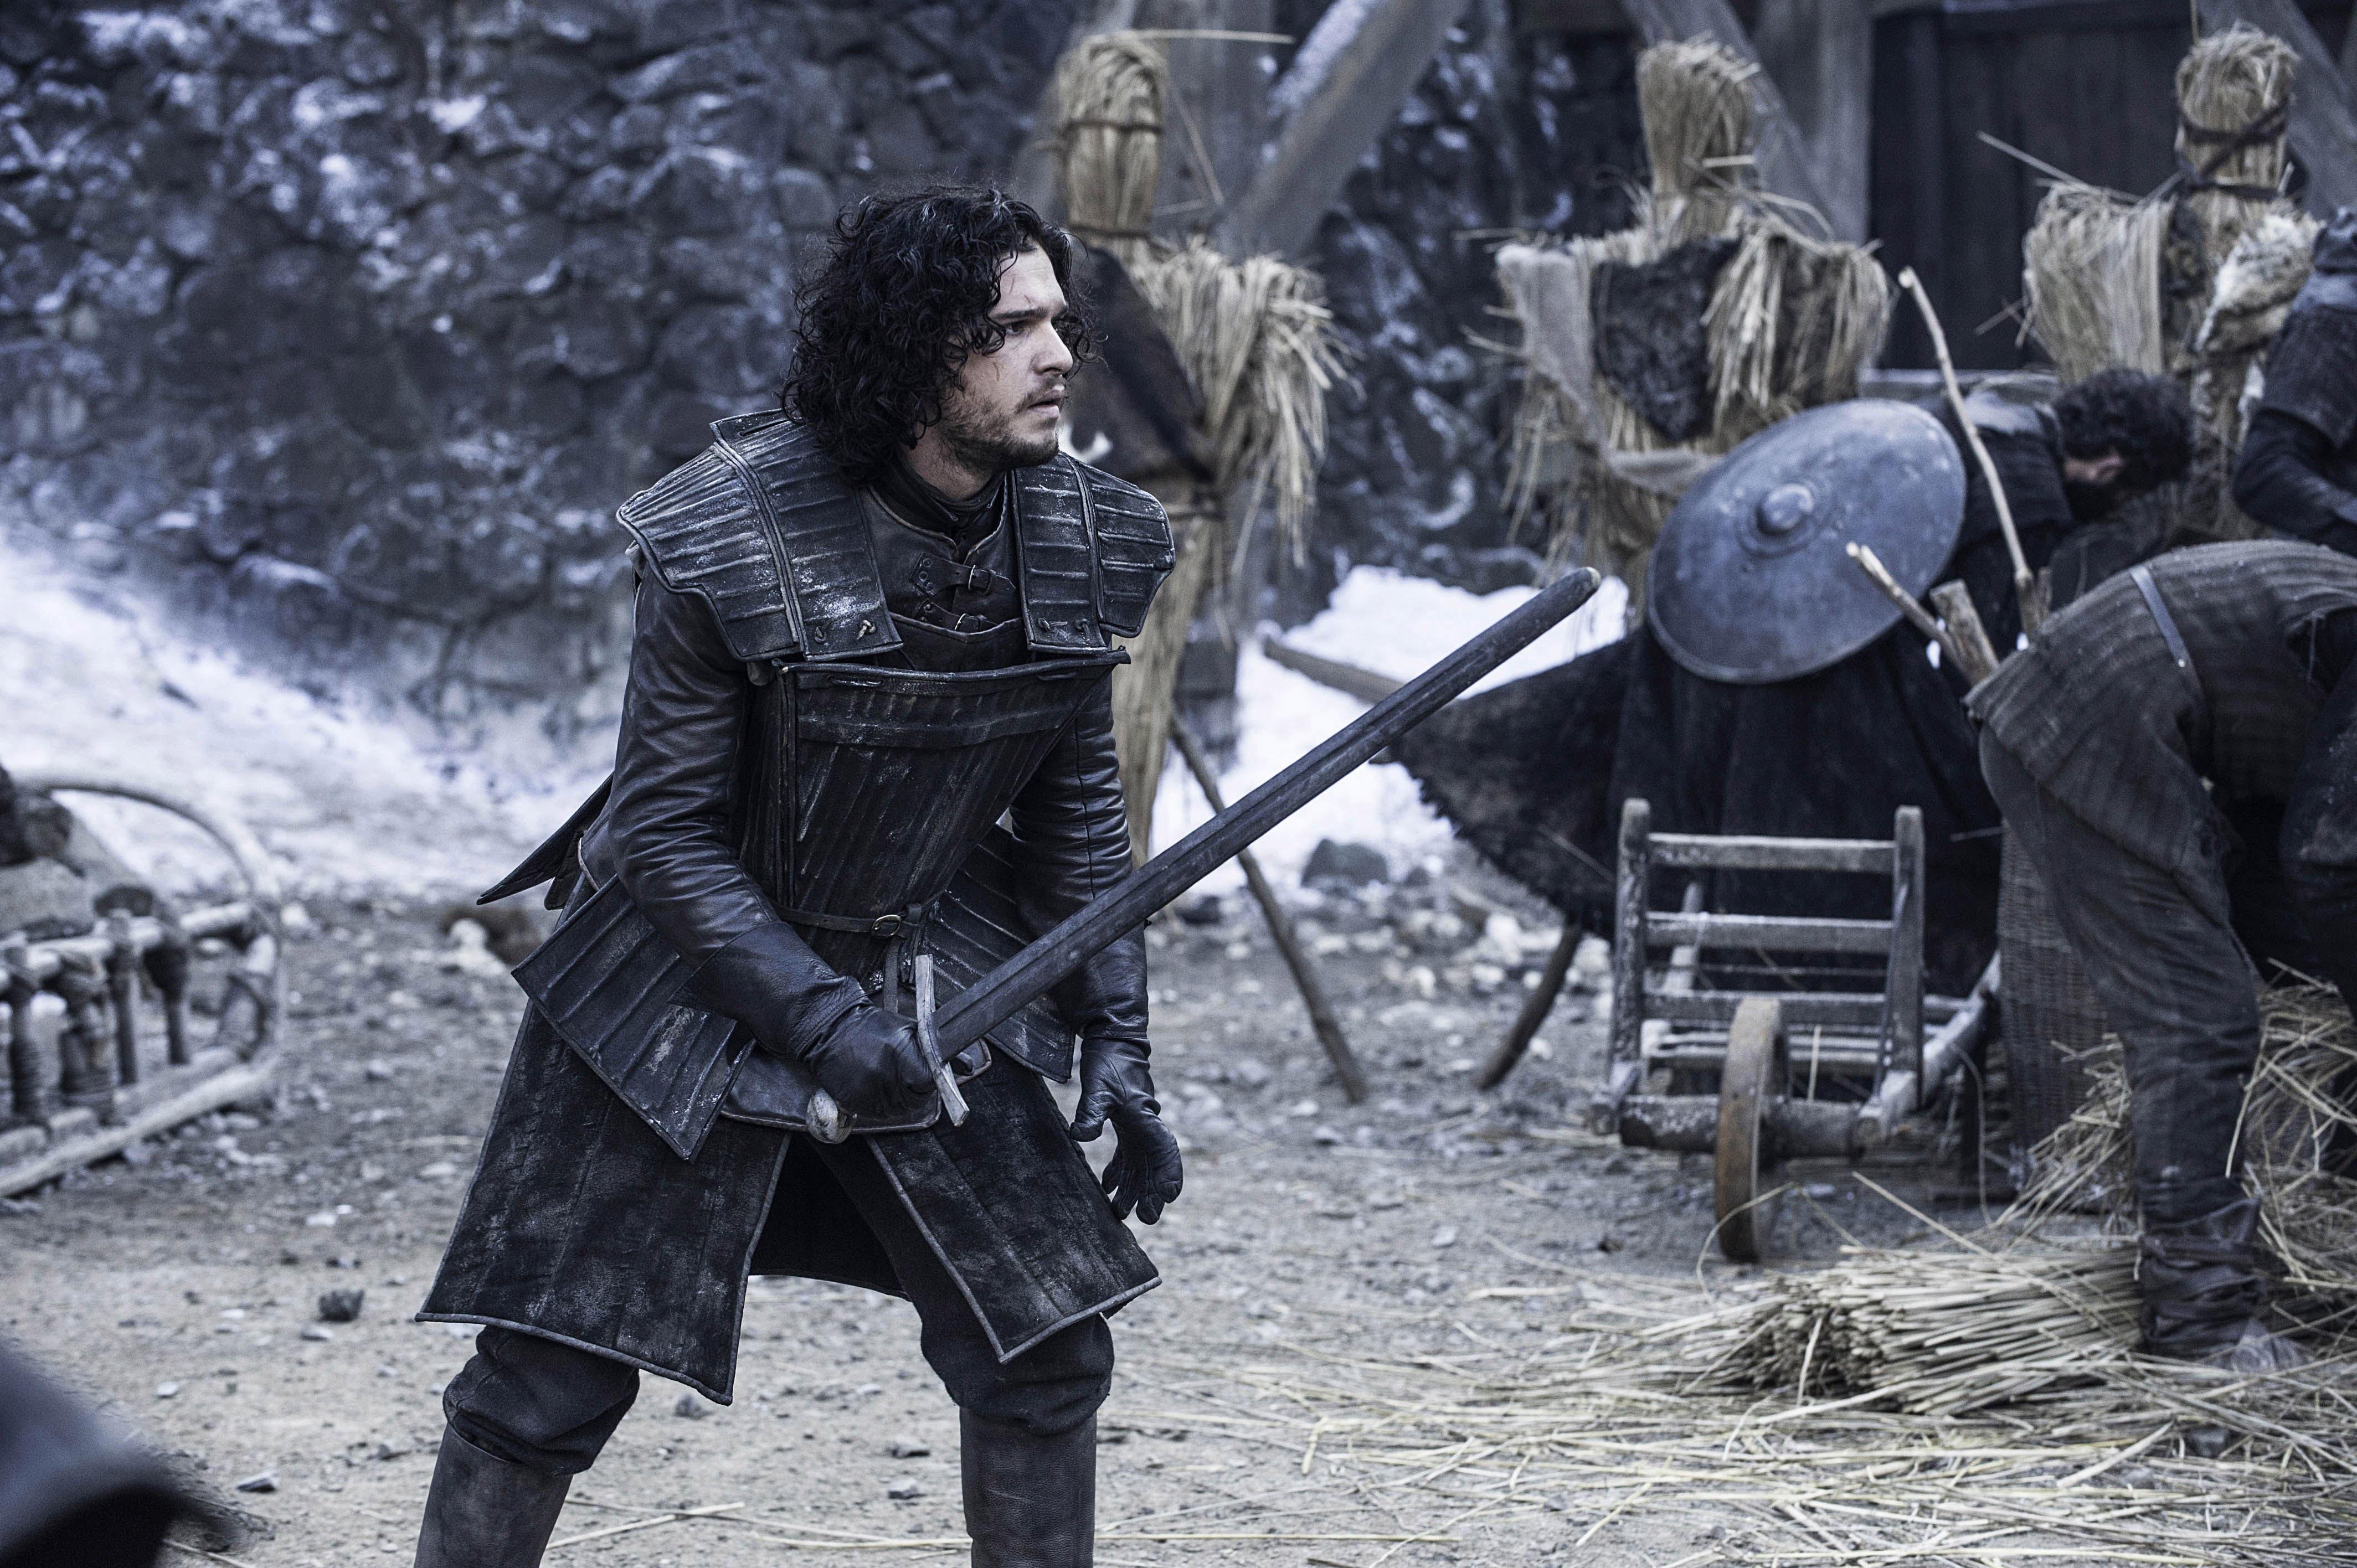 Men/'s Jon Snow Costume Cape Top FREE SWORD Game of Thrones Medieval Fancy Dress